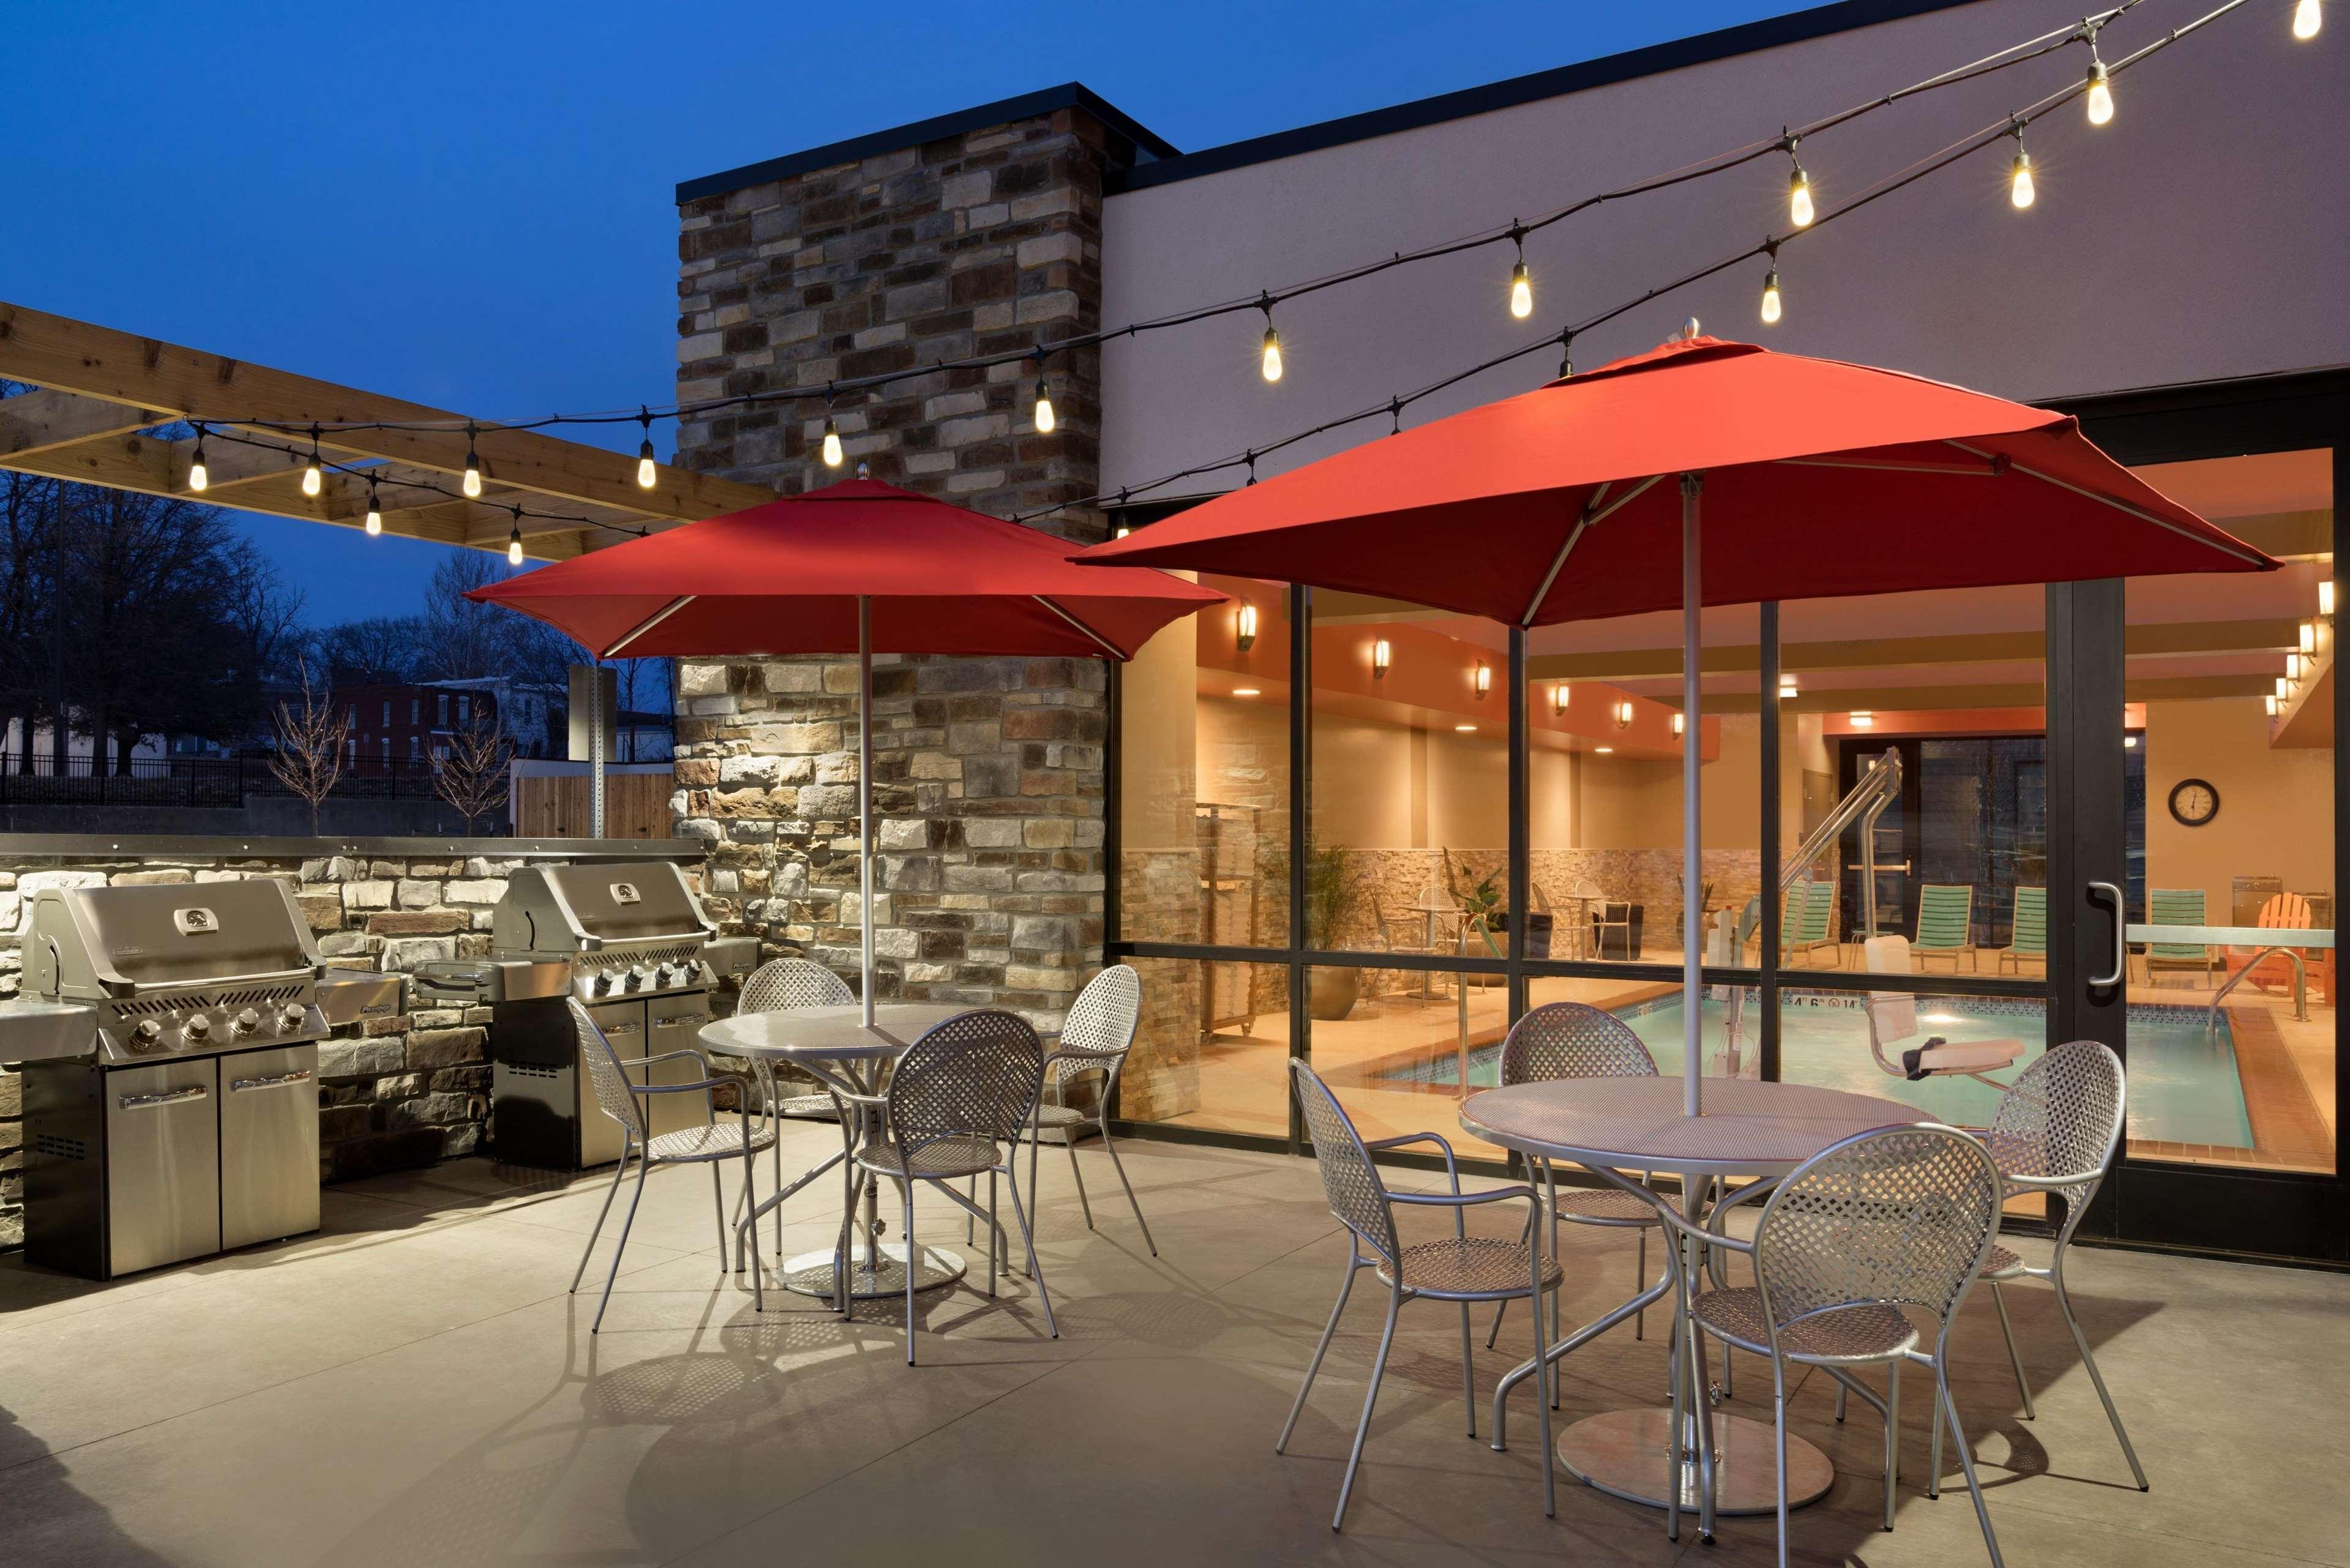 Home2 Suites by Hilton Leavenworth Downtown image 3